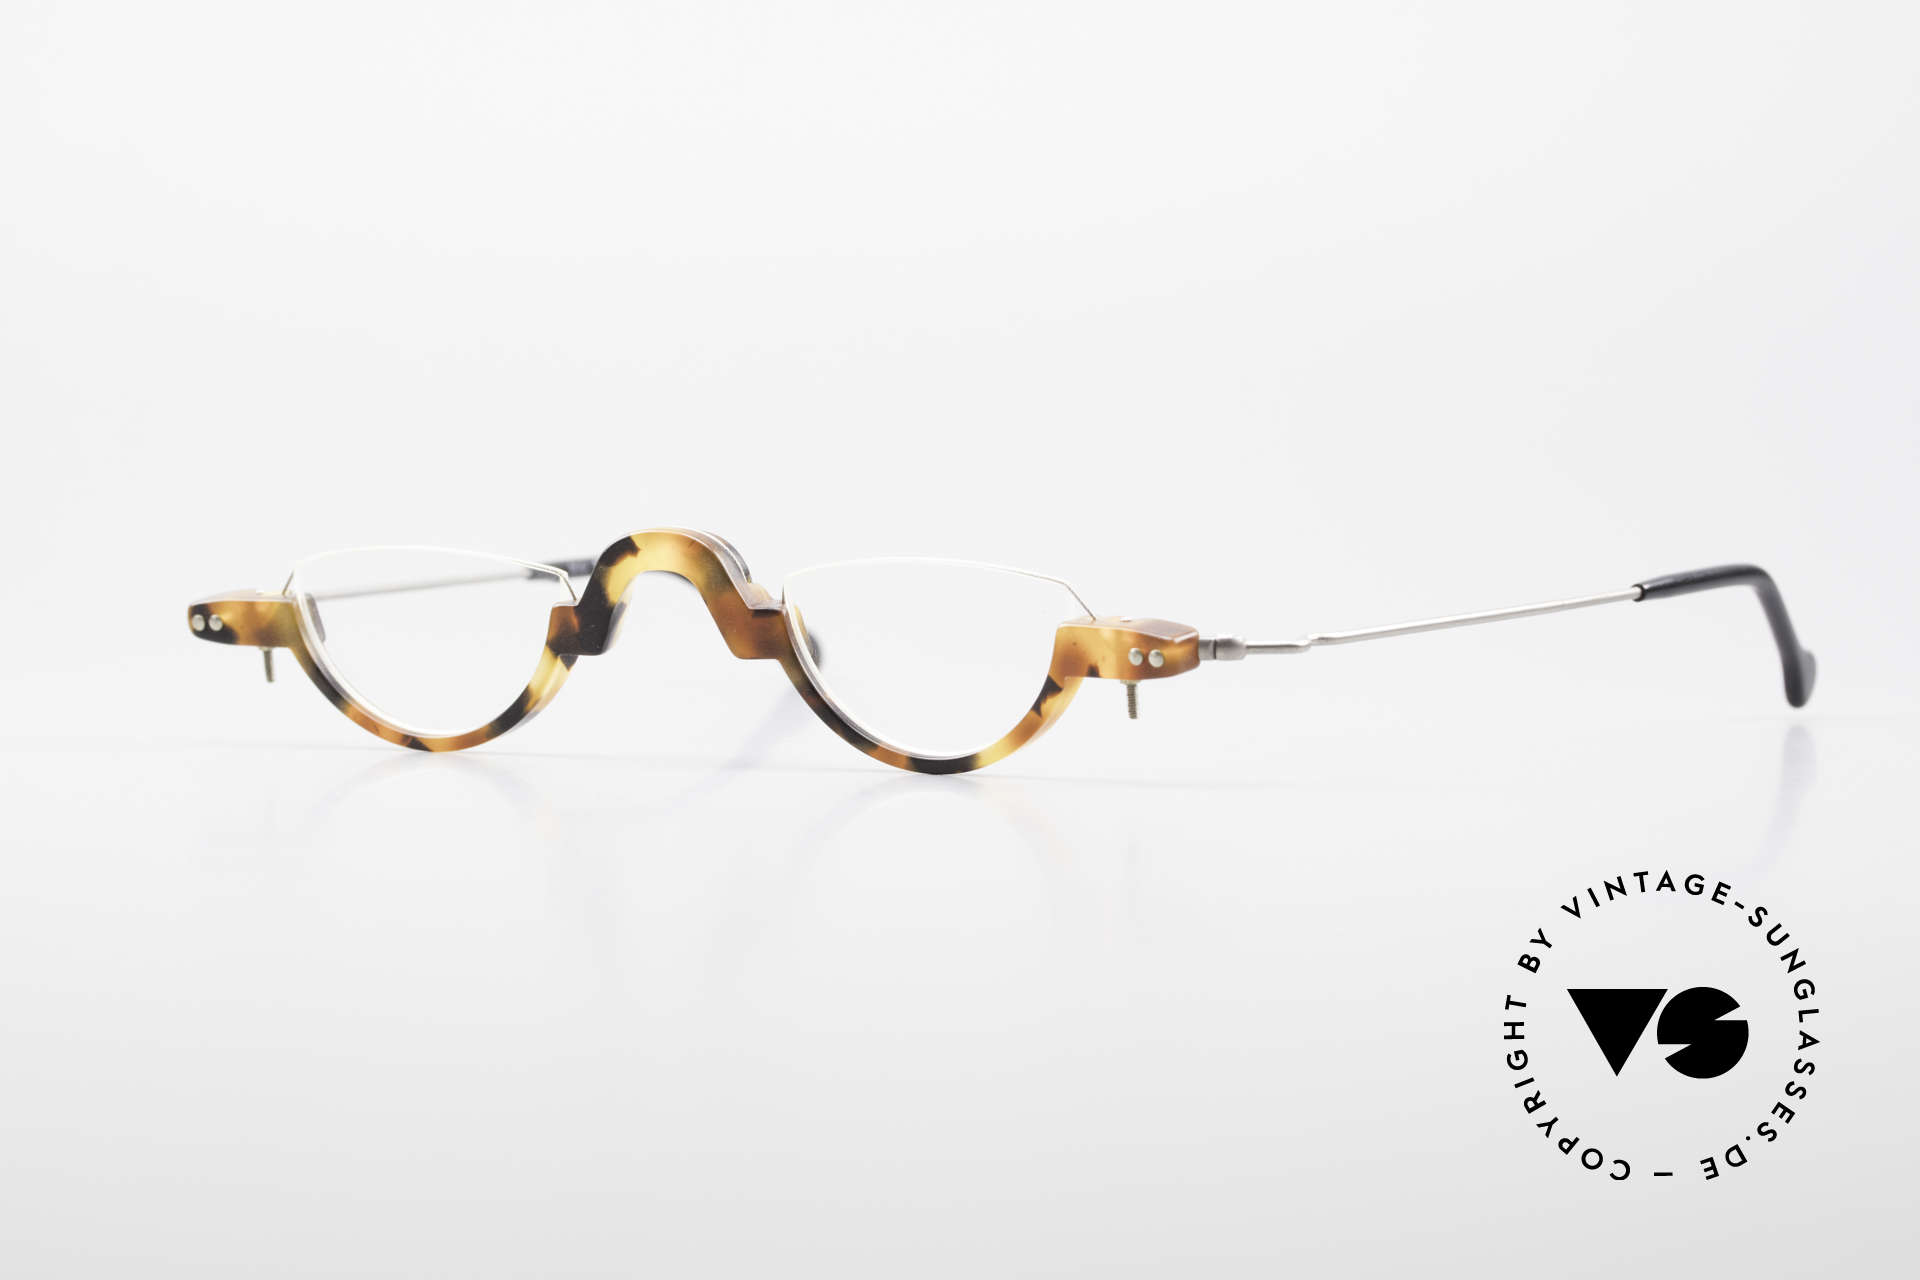 MDG Bauhaus 5010 Minimalist Reading Glasses 90s, MDG 5010: minimalist reading glasses, Bauhaus style, Made for Men